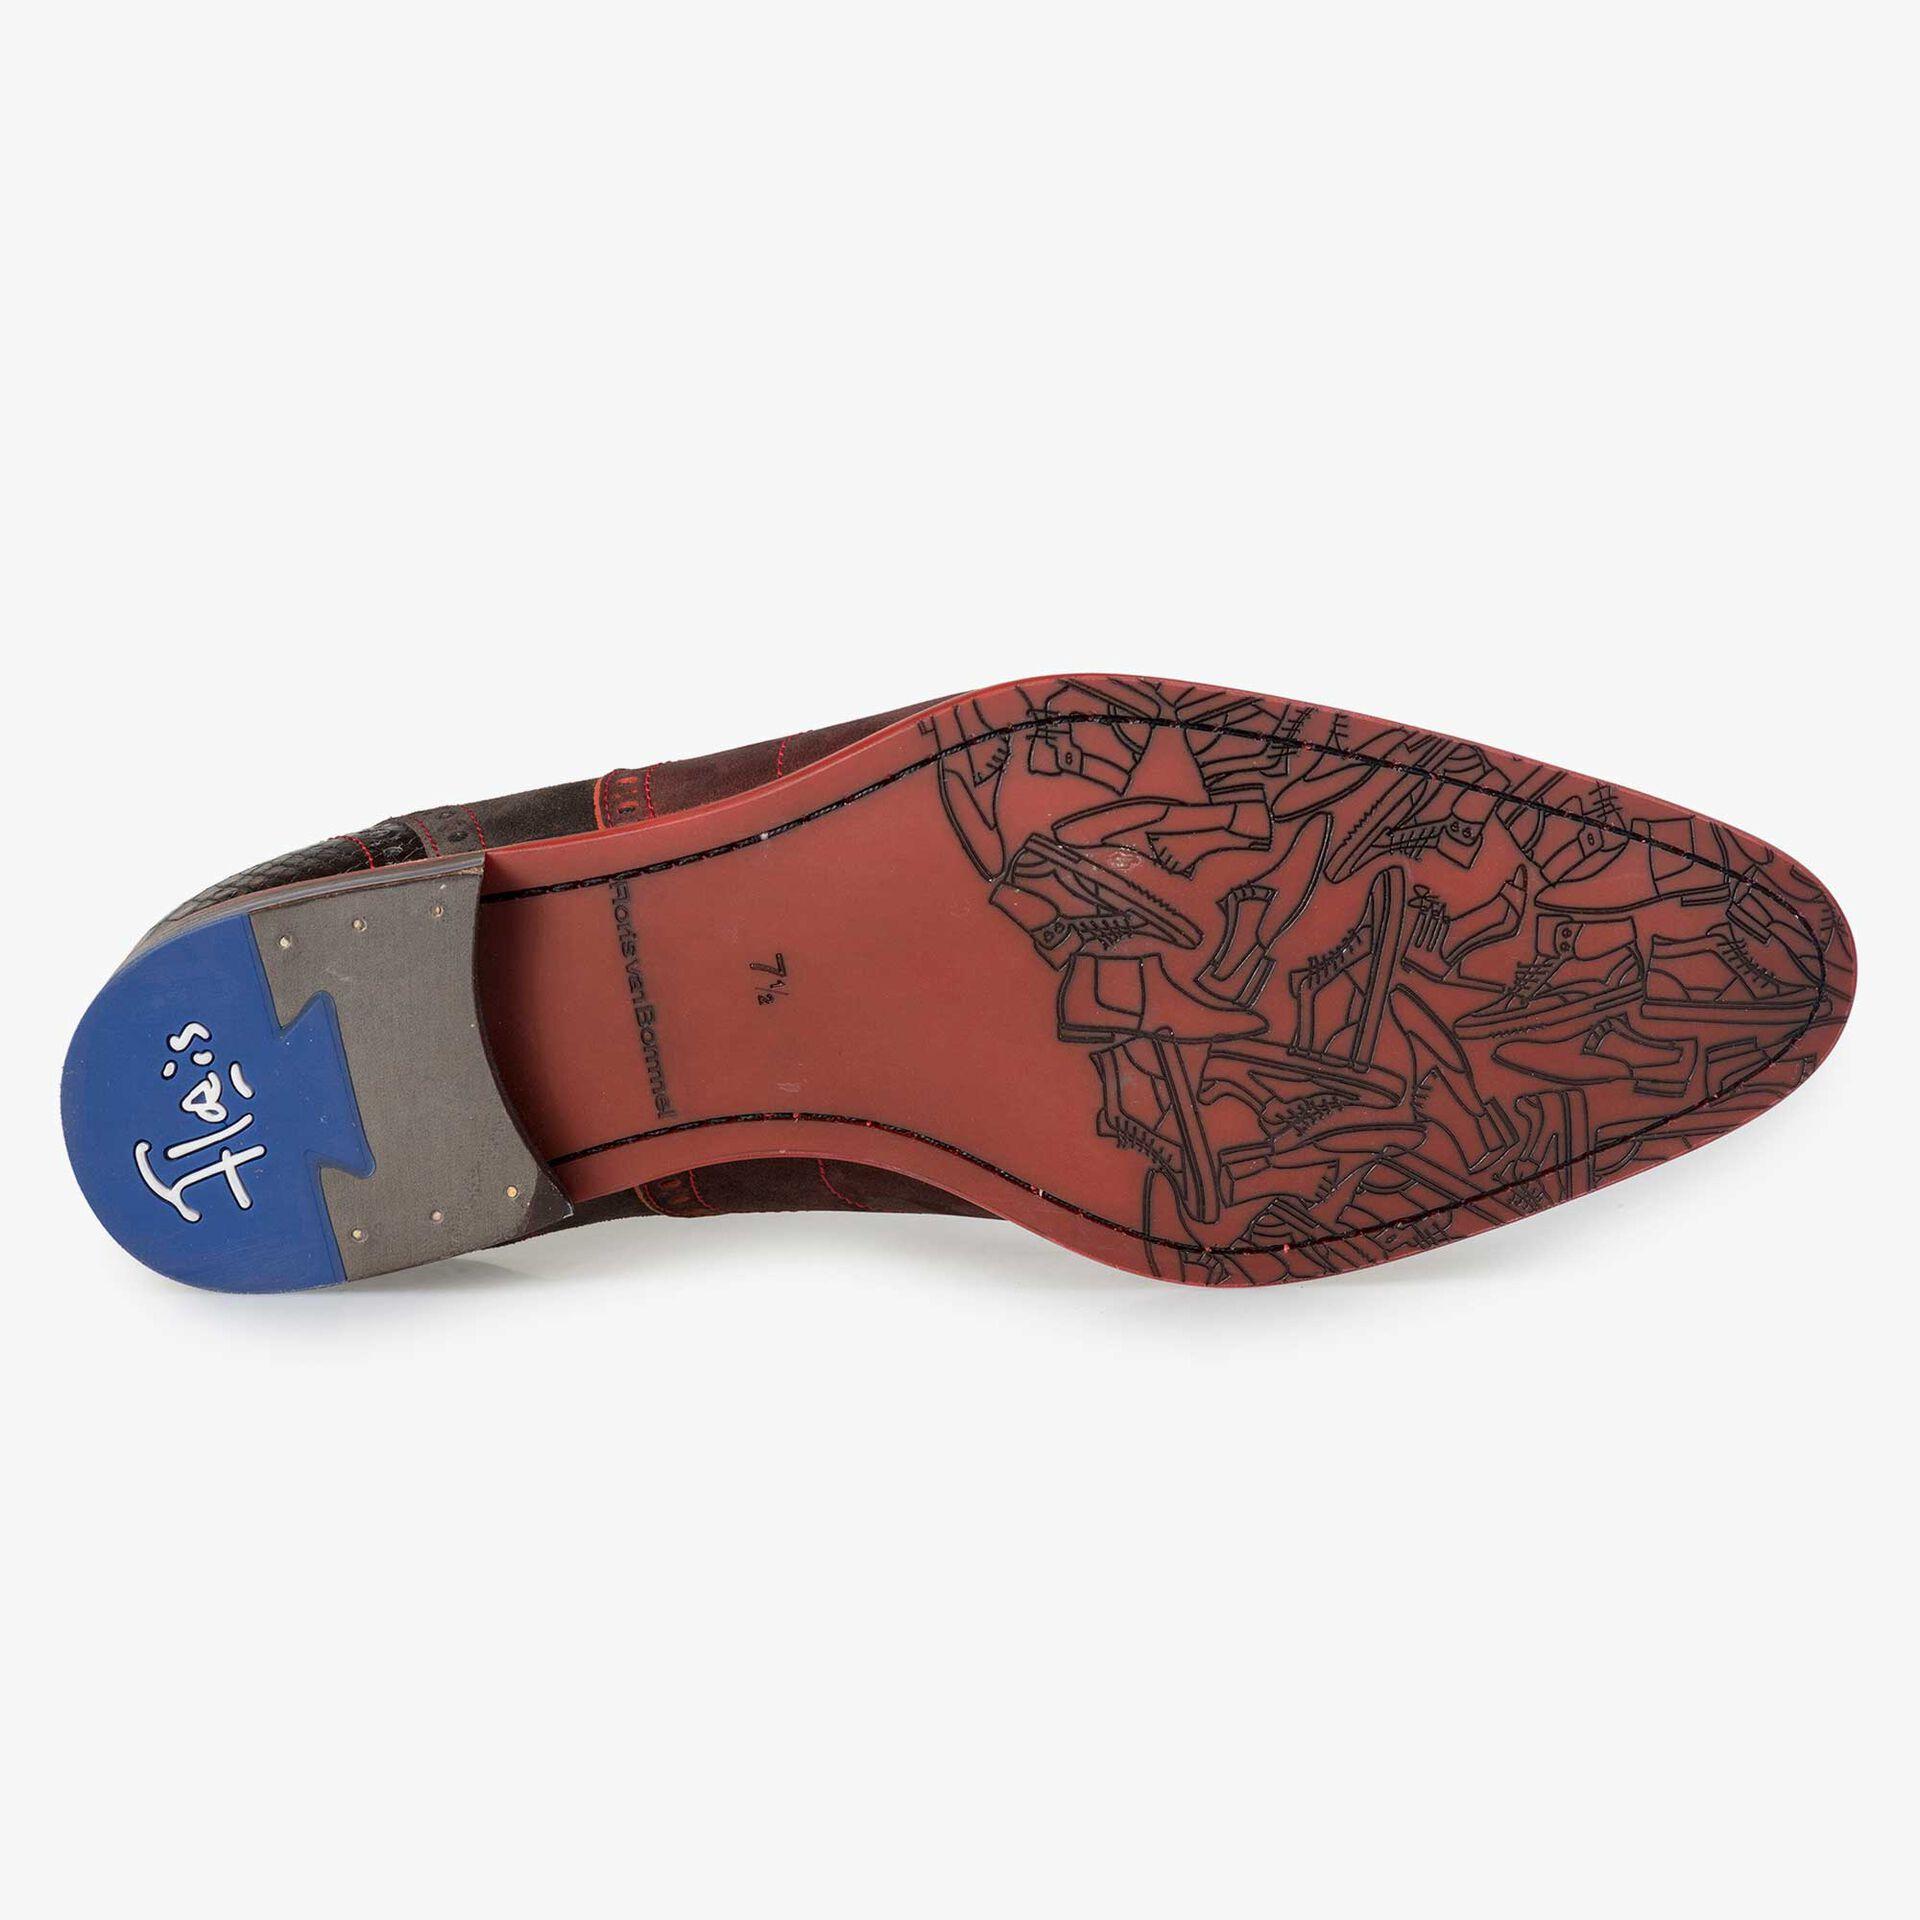 Floris van Bommel dark red brogue lace shoe